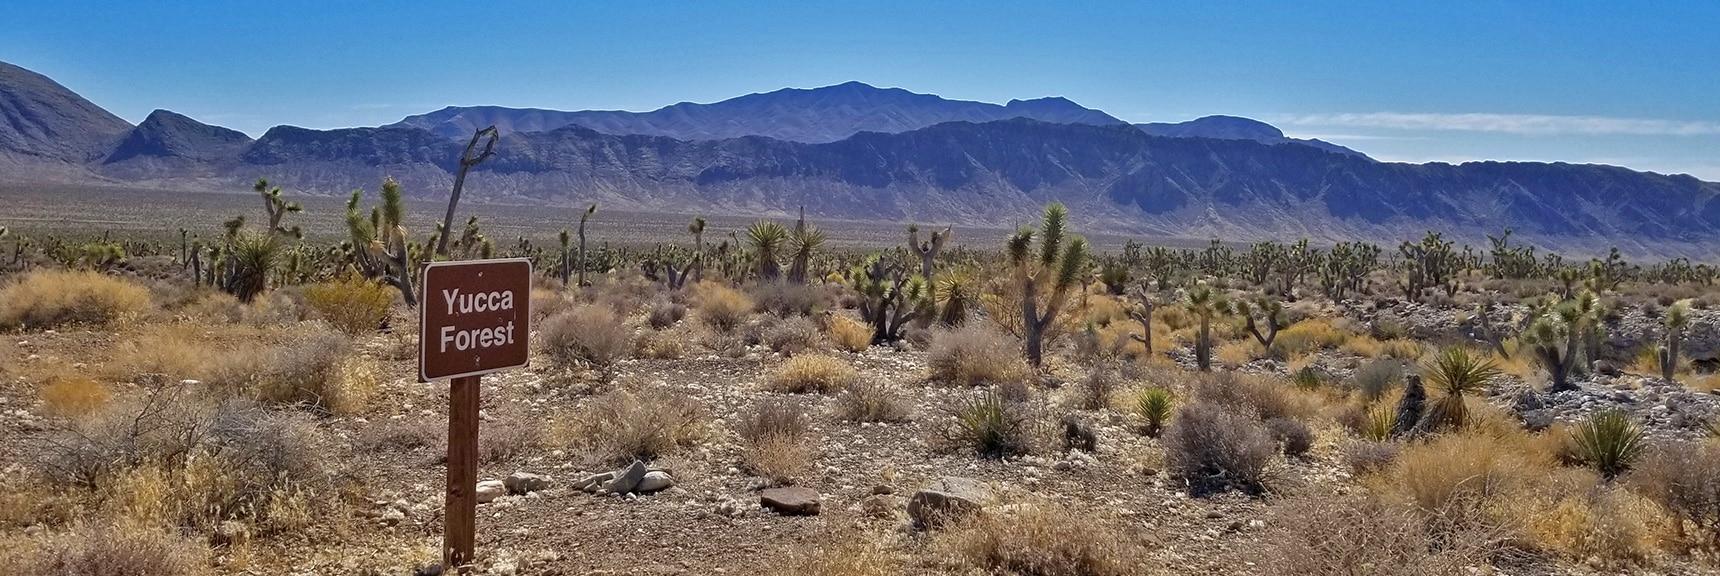 Gass Peak Viewed from Mormon Well Road   Lower Mormon Well Road   Sheep Range, Desert National Wildlife Refuge, Nevada